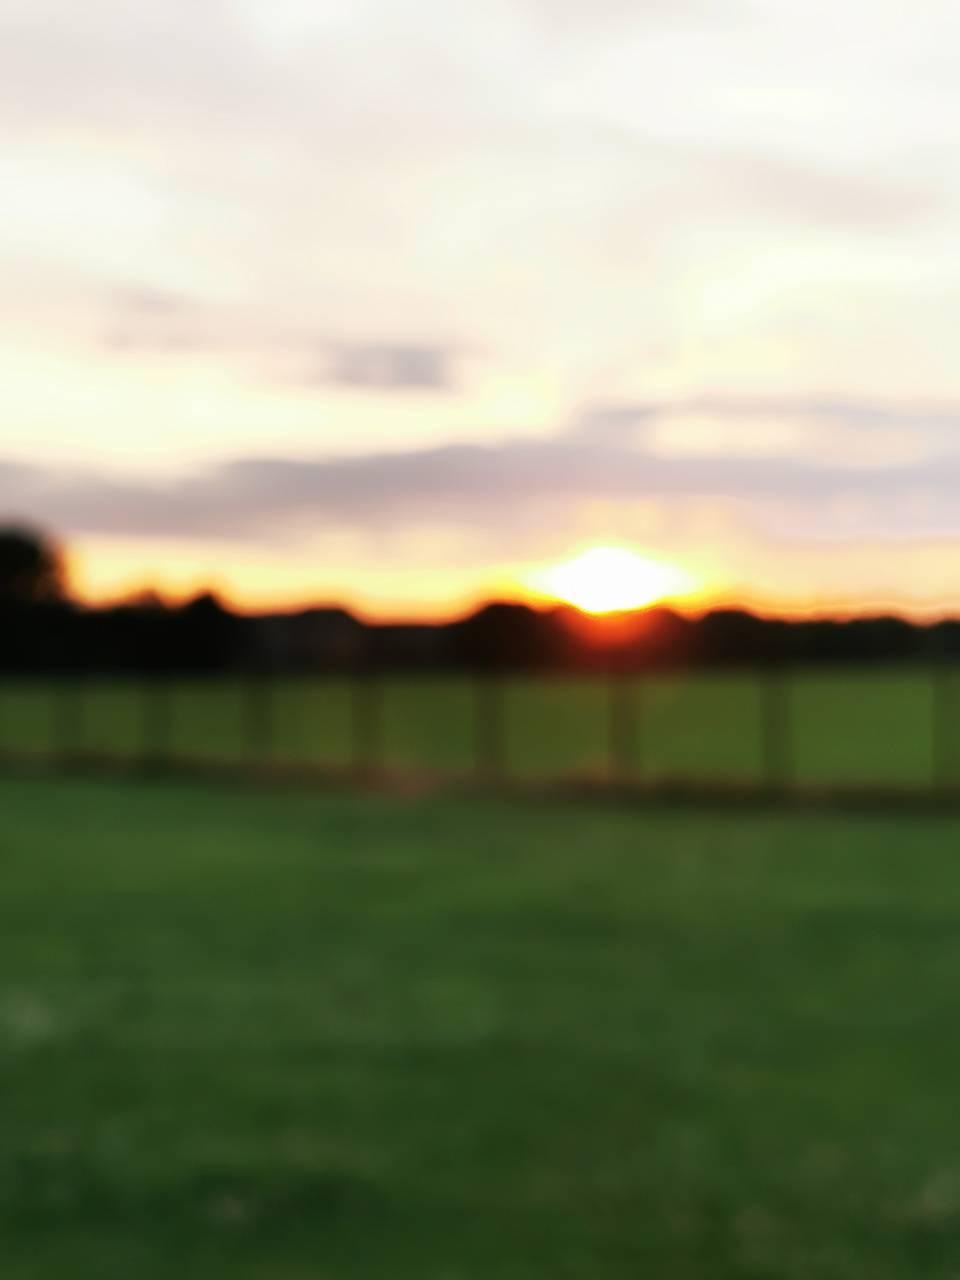 Blurry sunset